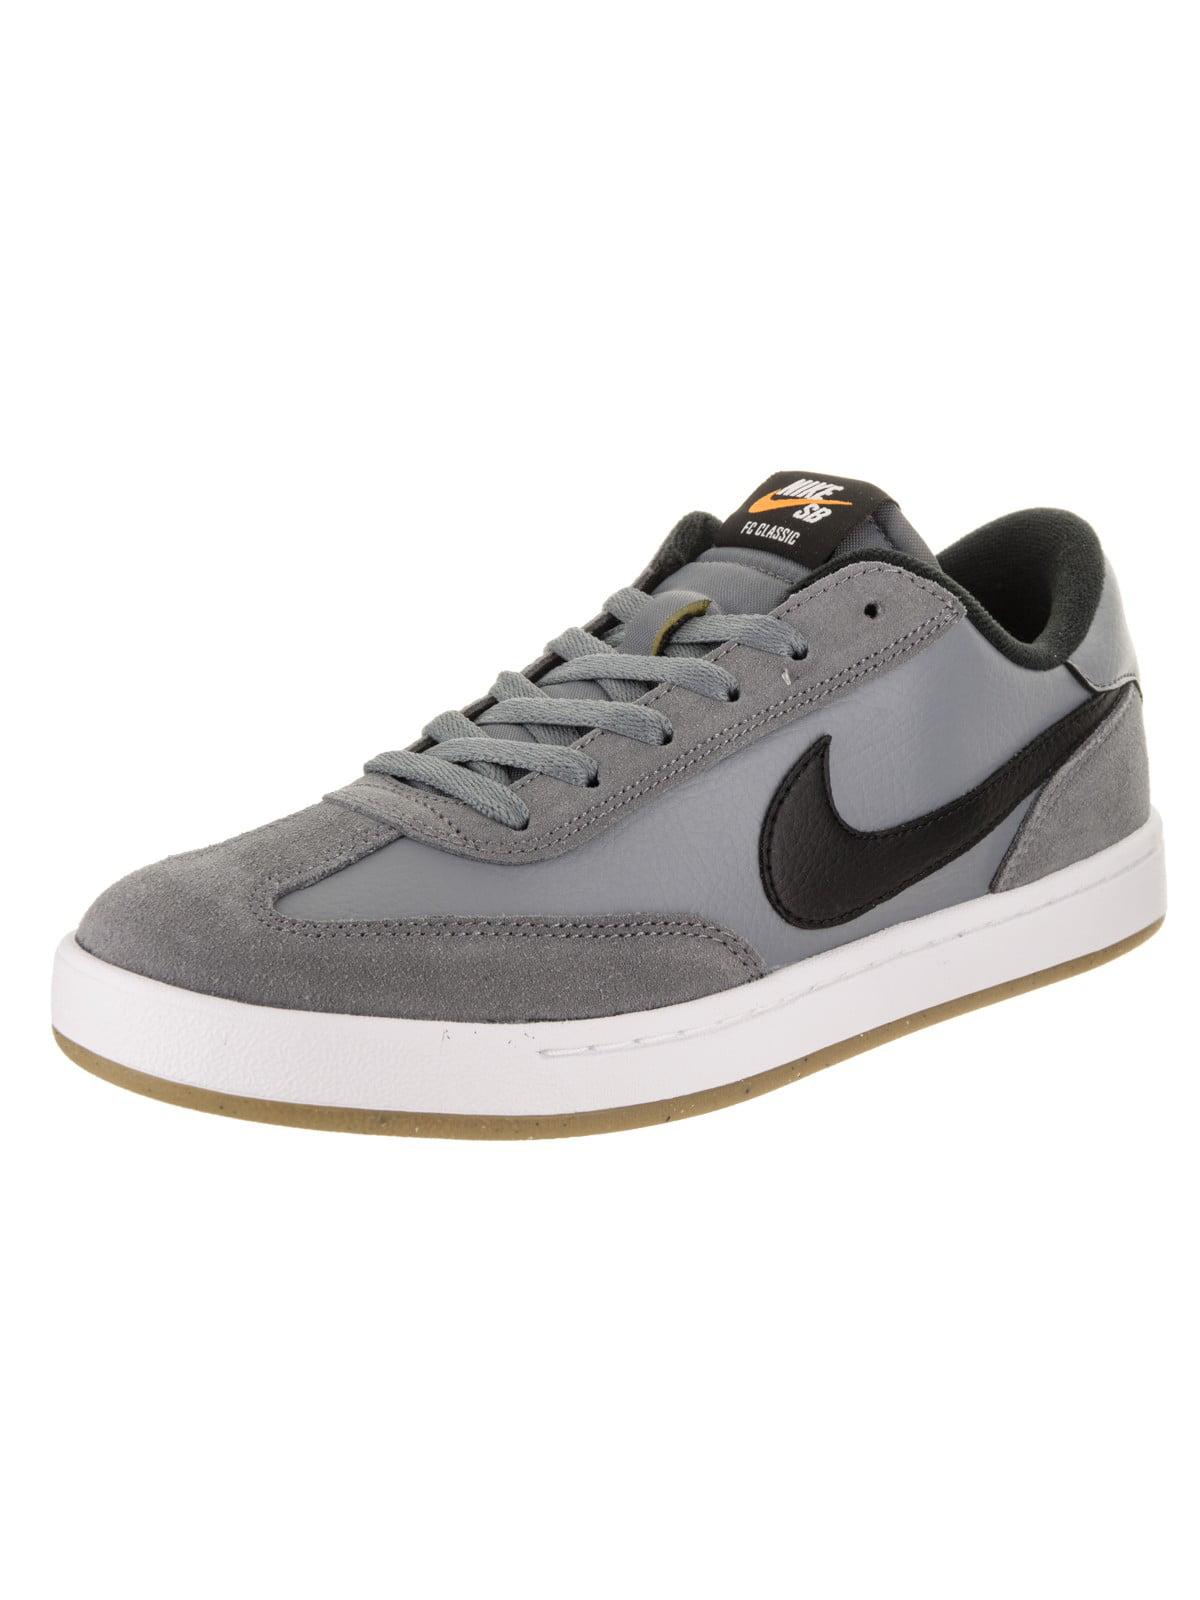 brand new 825fb fb701 Nike Mens SB FC Classic Skate Shoe